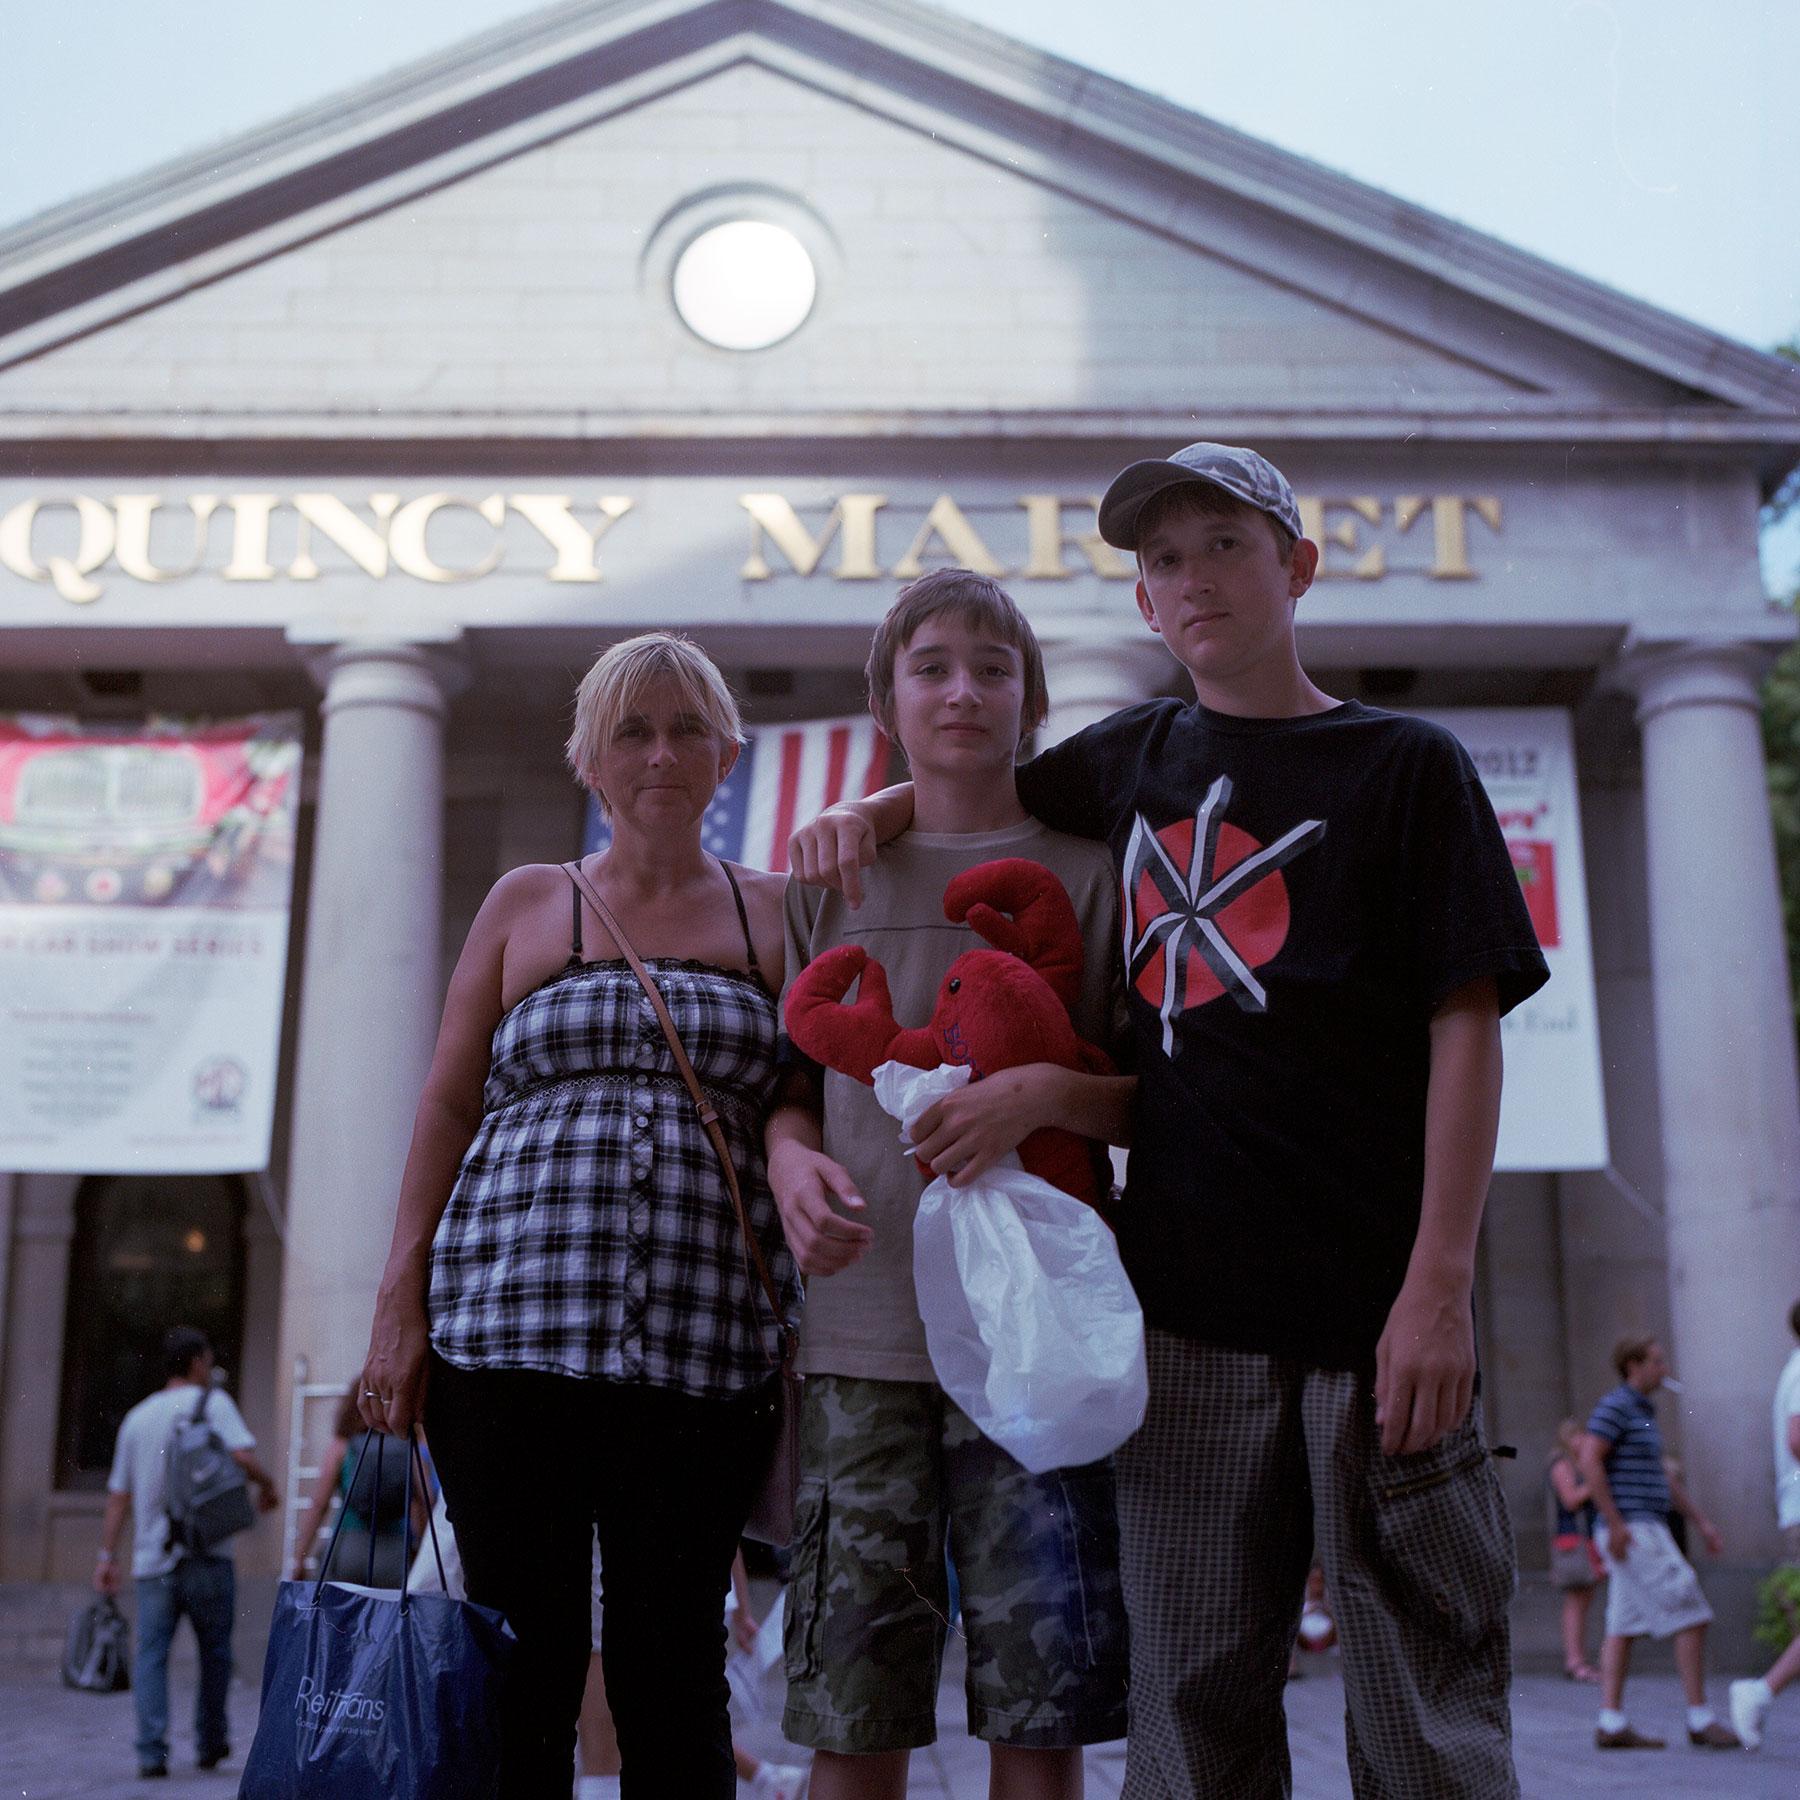 Boston Hasselblad500cm Kodak Portra 160nc Film